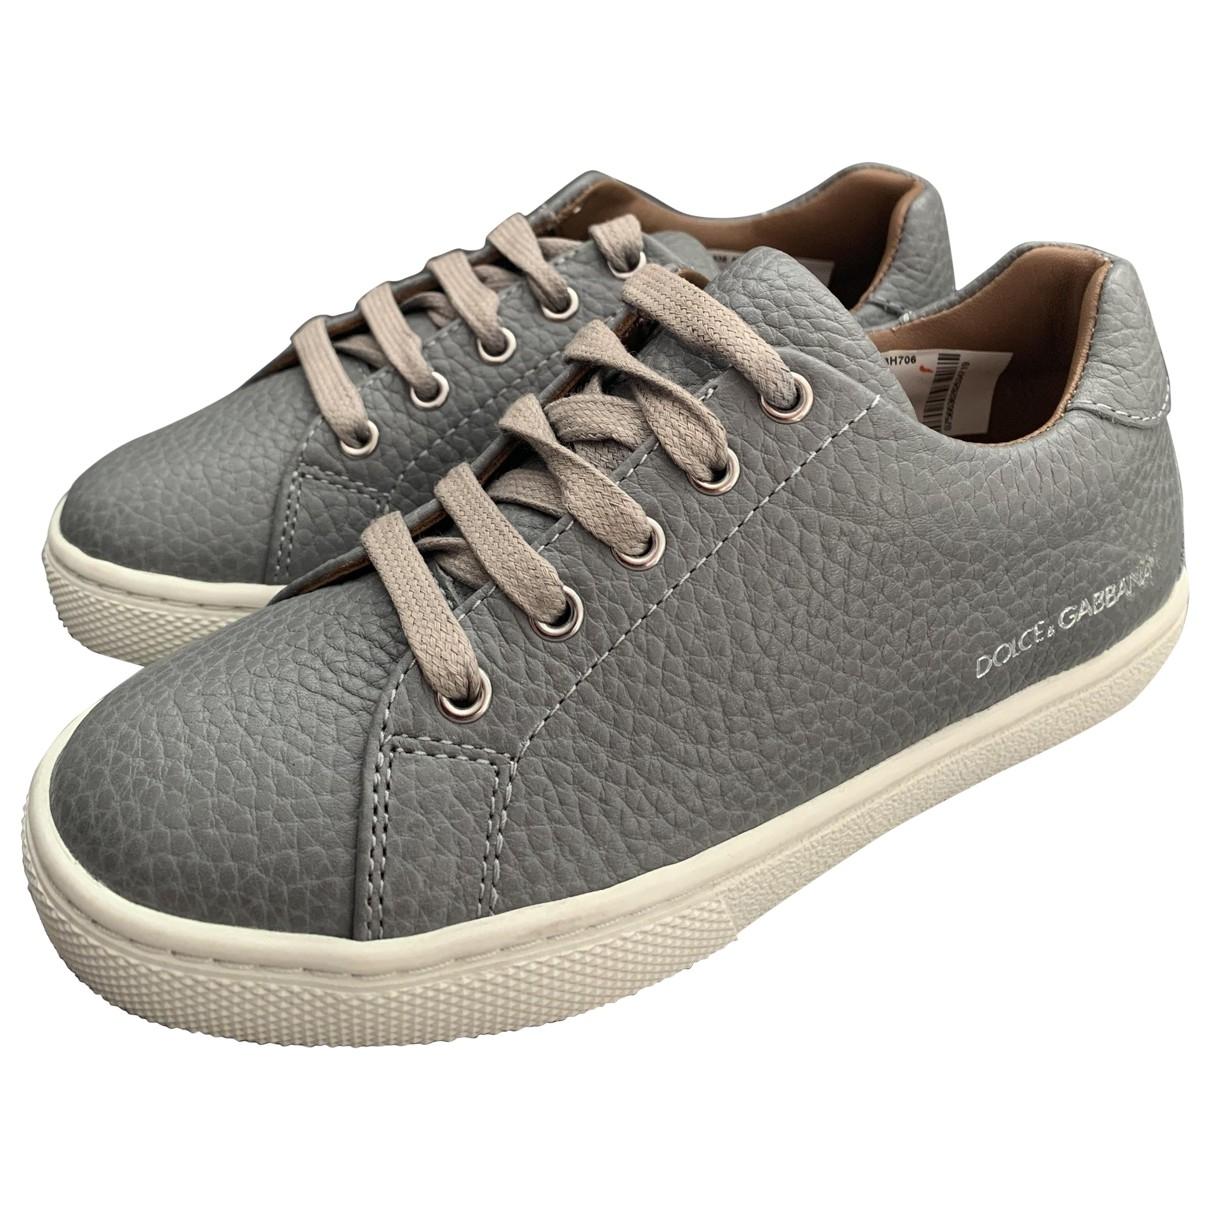 Dolce & Gabbana \N Grey Leather Trainers for Kids 28 EU